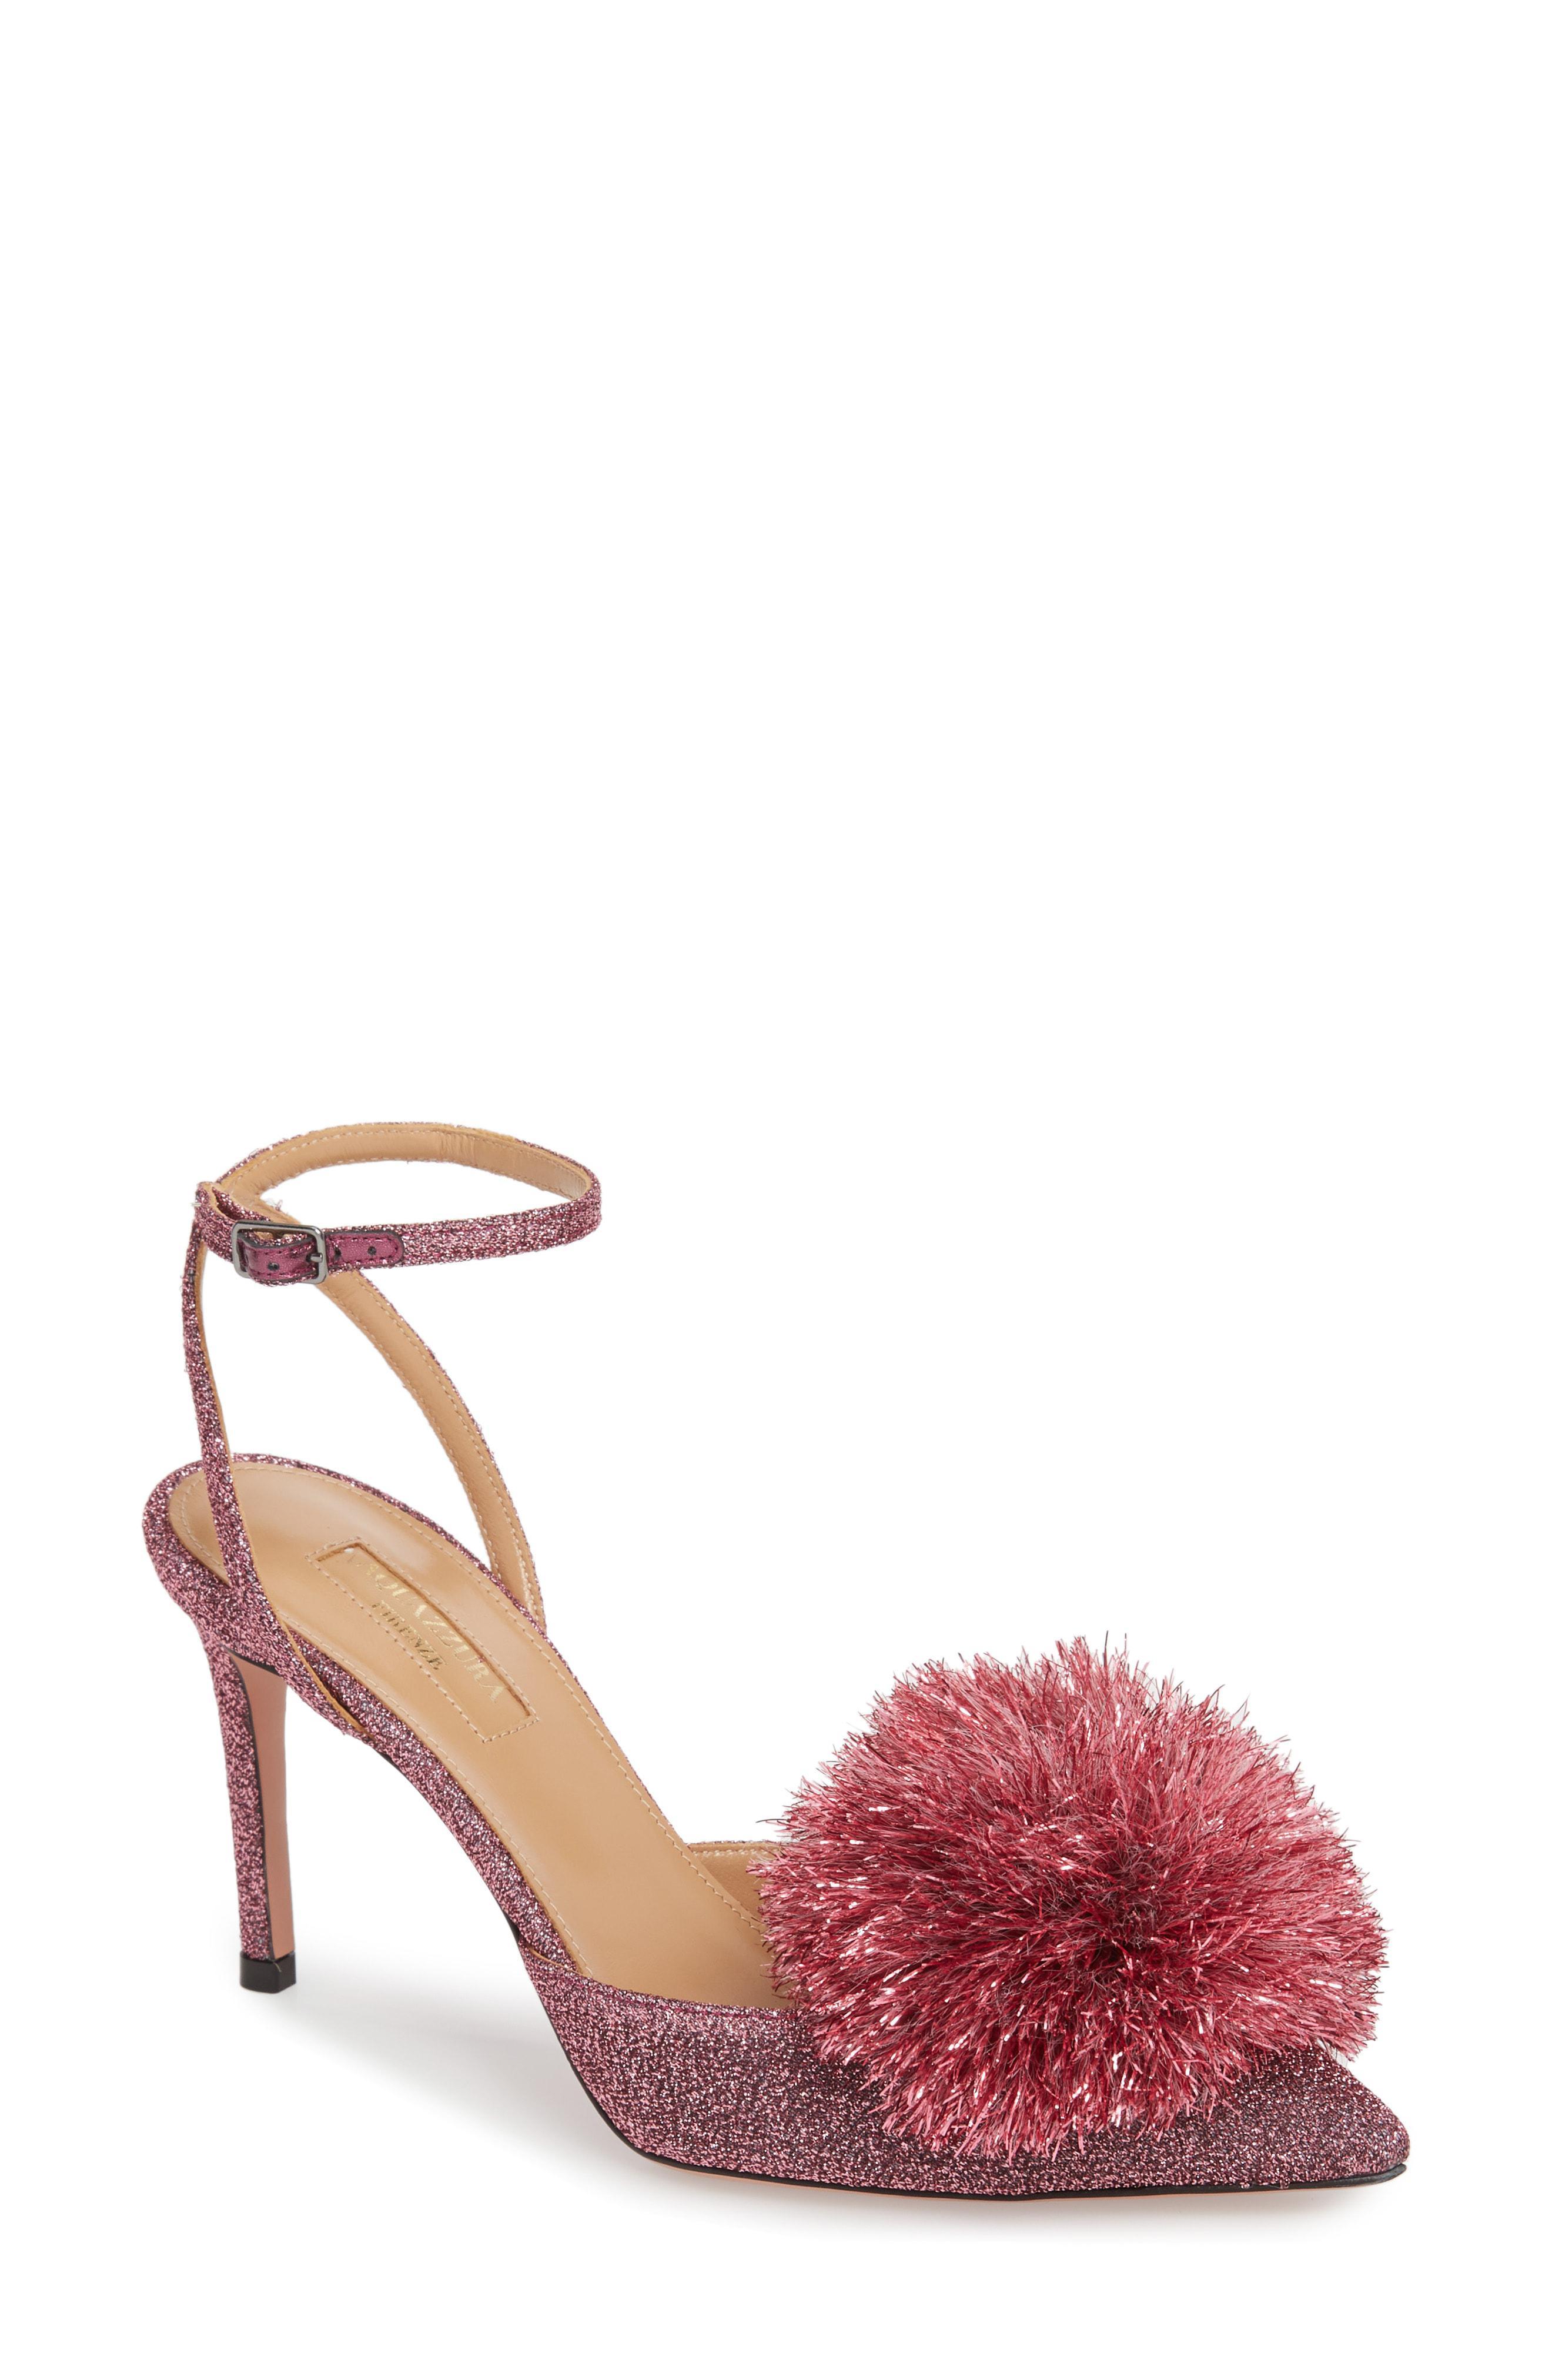 6eda30e4ae4 Lyst - Aquazzura Powder Puff Ankle Strap Pump (women) in Pink